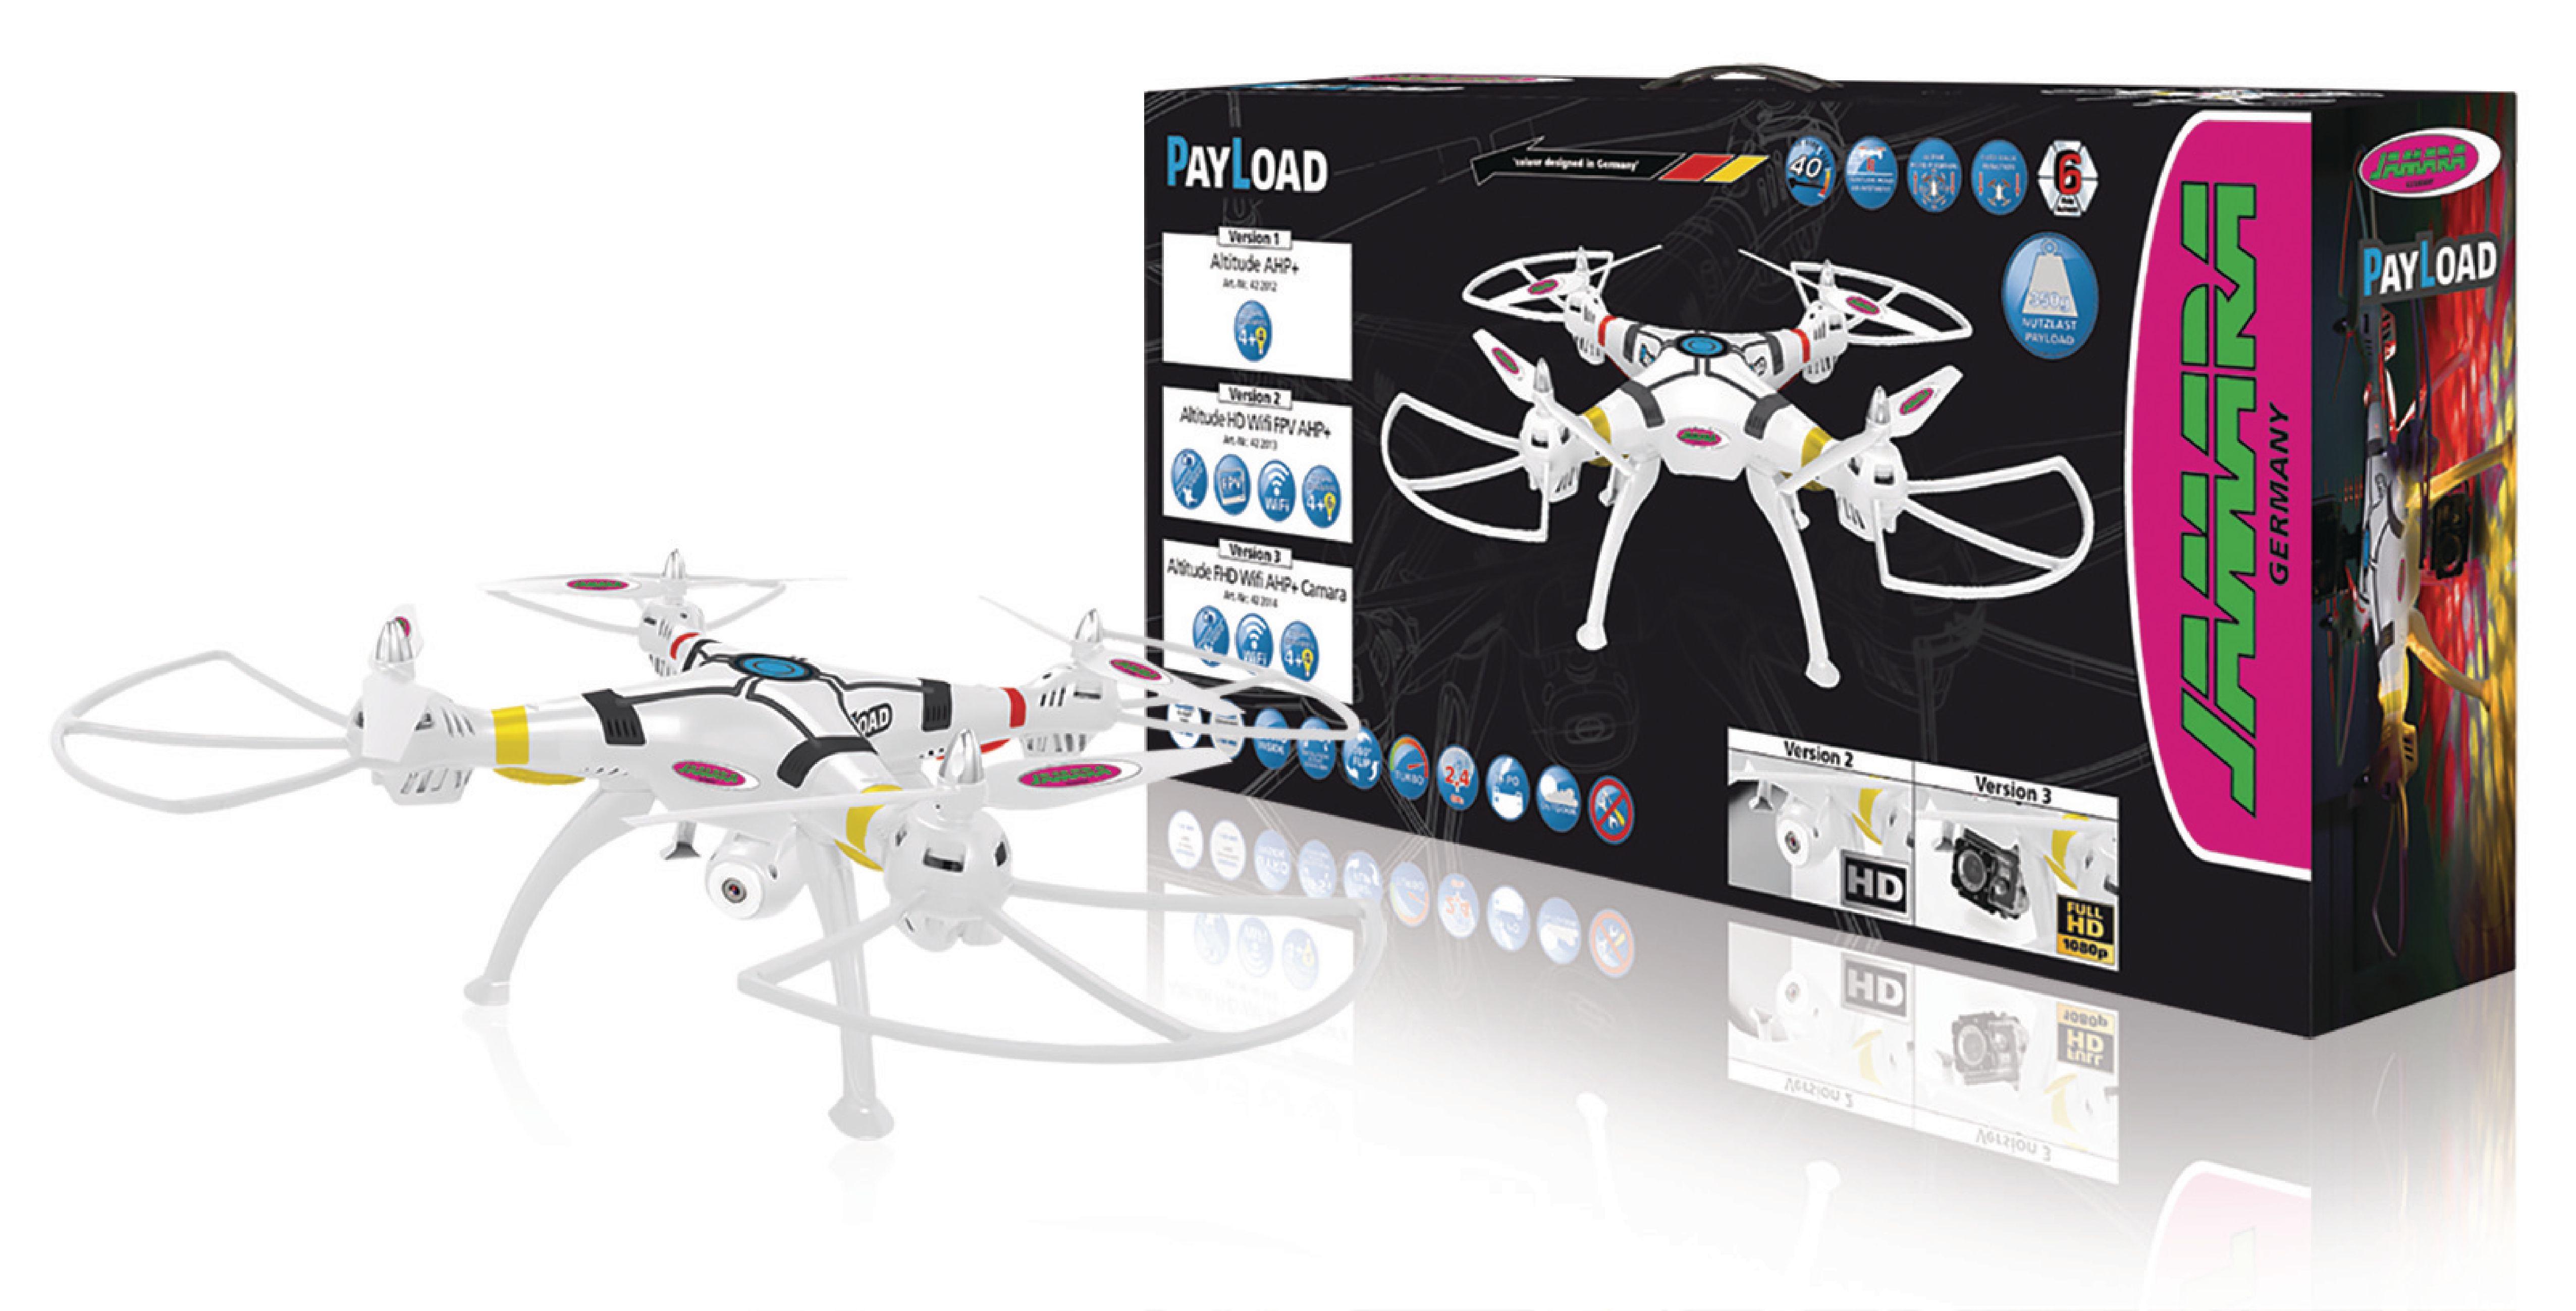 R/C Drone Payload Altitude 4+6 Channel RTF / Foto / Video / Gyro Indeni / Med Belysning / 360 Flip / FPV 2,4 GHz Styring Hvid